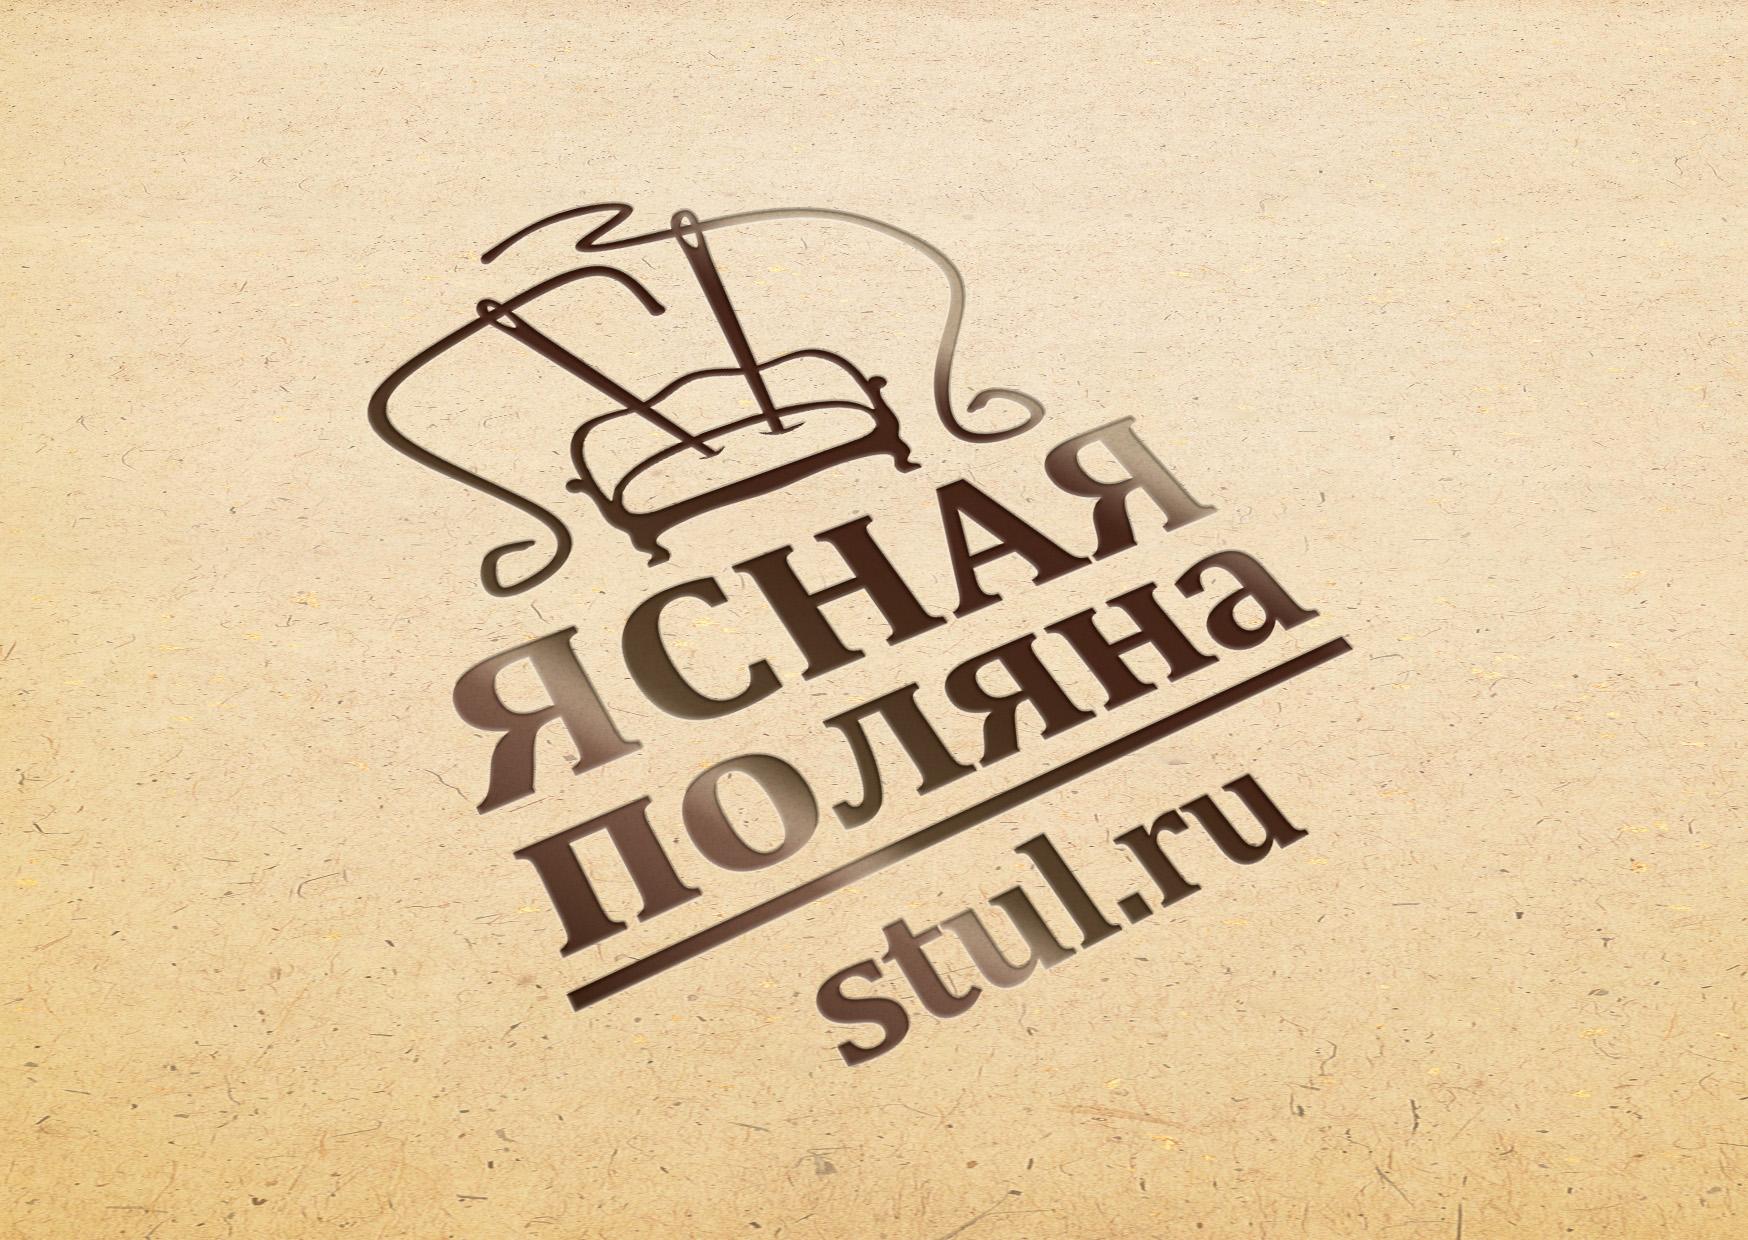 логотип и дизайн для билборда фото f_60054a2c1aab7cfb.jpg